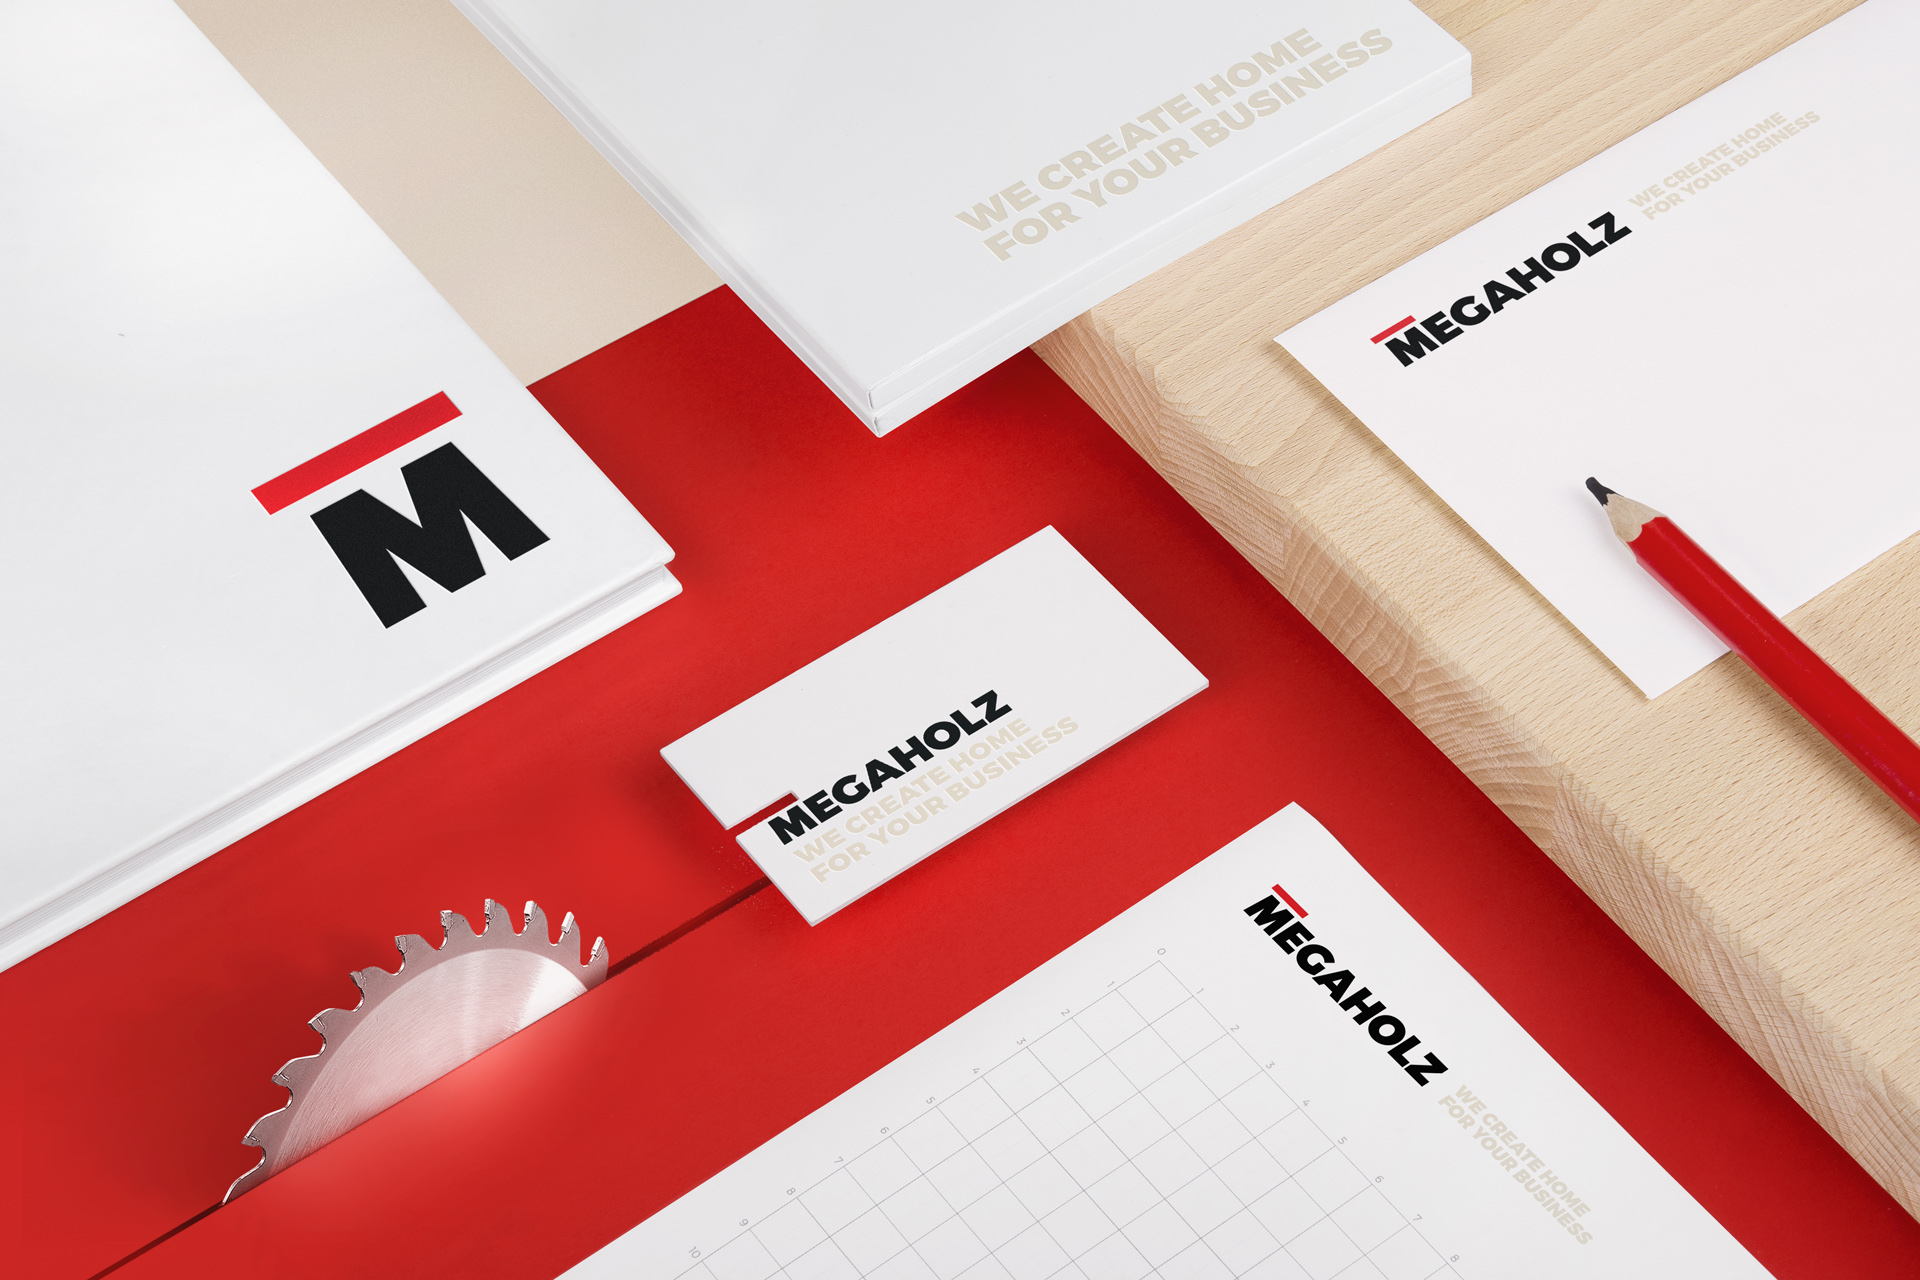 Megaholz Branding